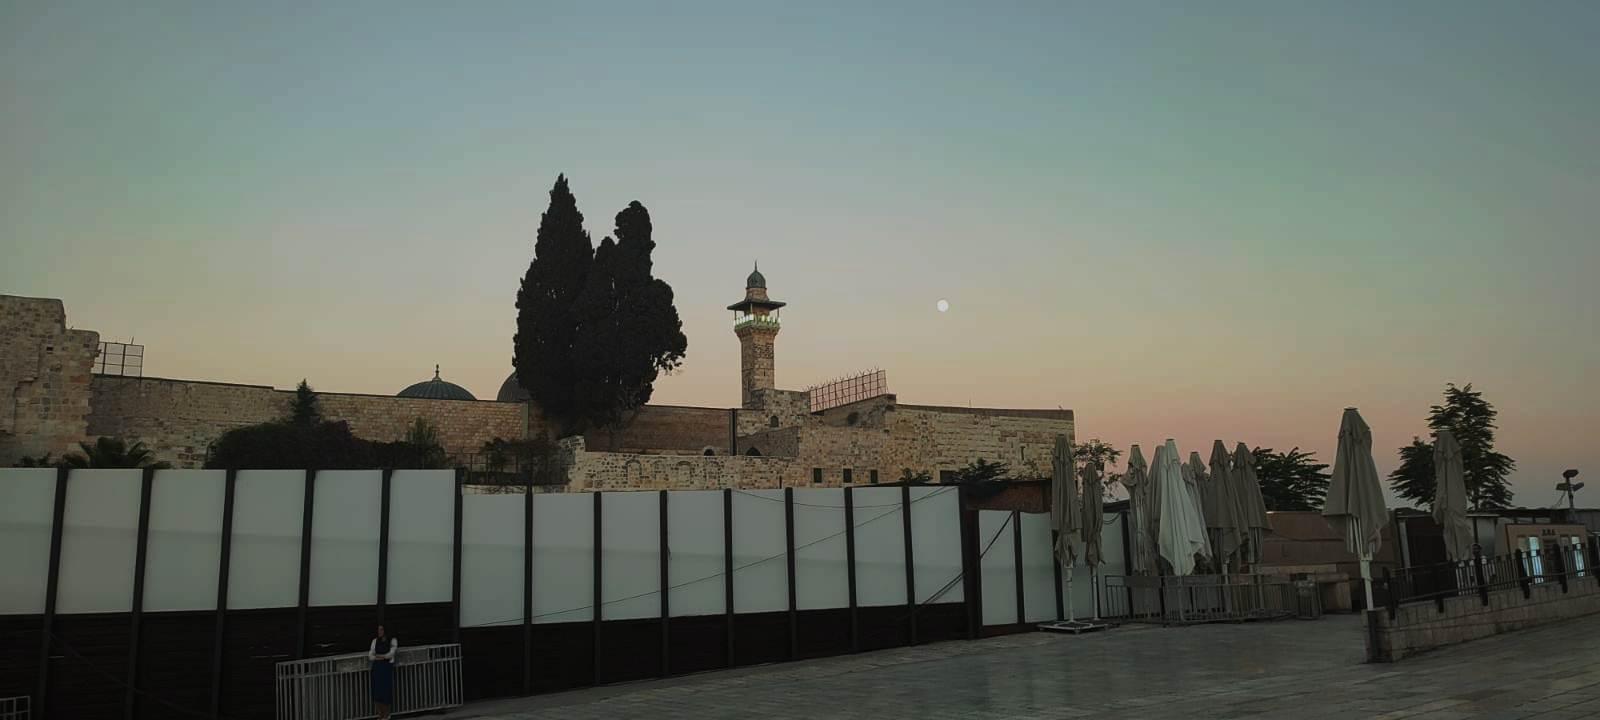 12. Вид с площади у стены Плача